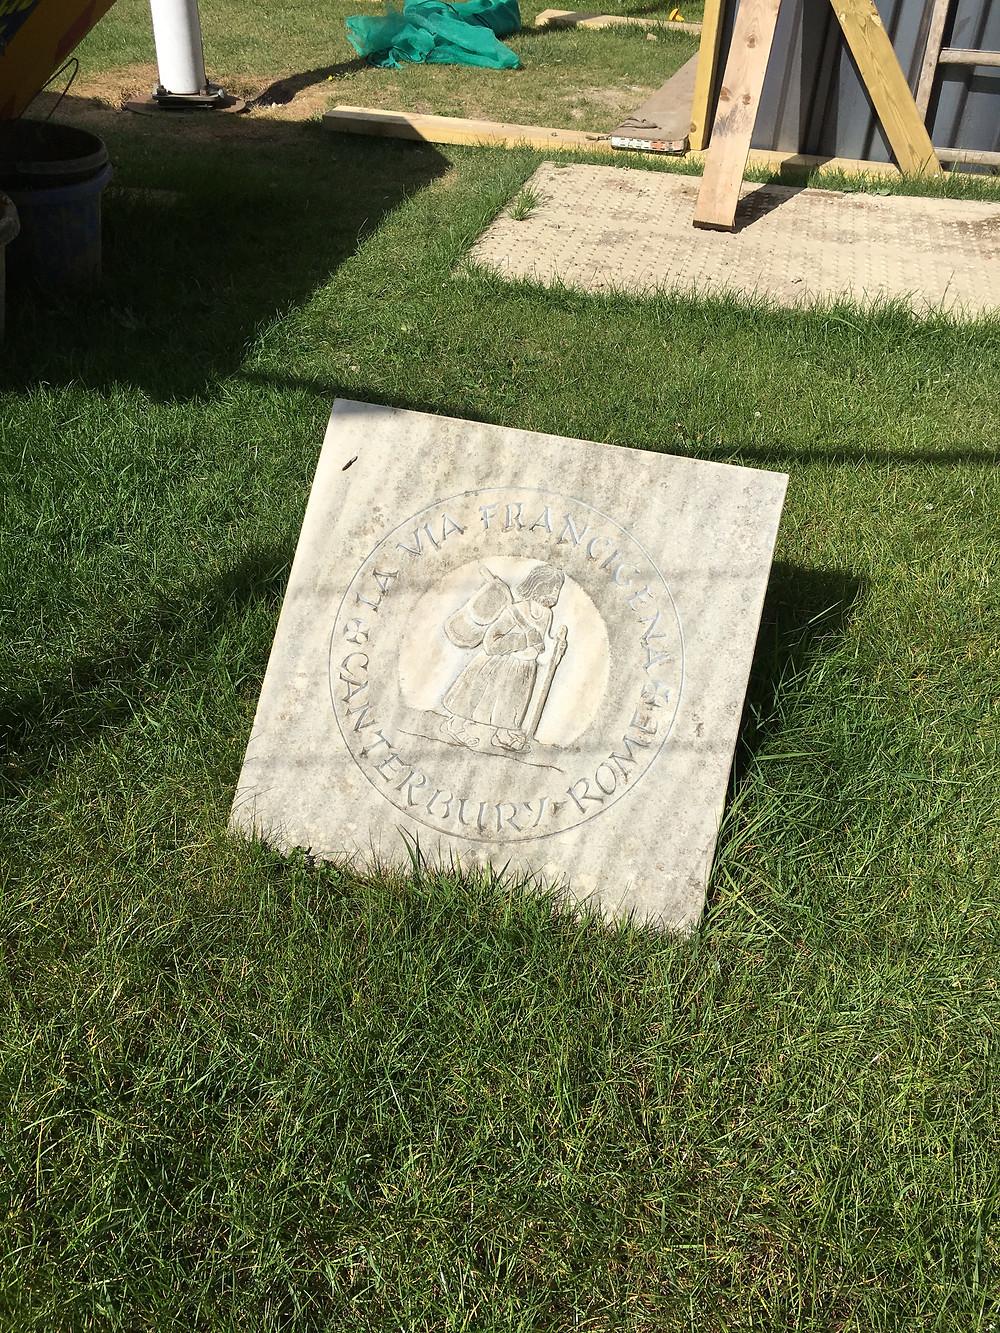 Marker stone Zero fo the Via Francigena outside the main entrance to Canterbury Catherdral